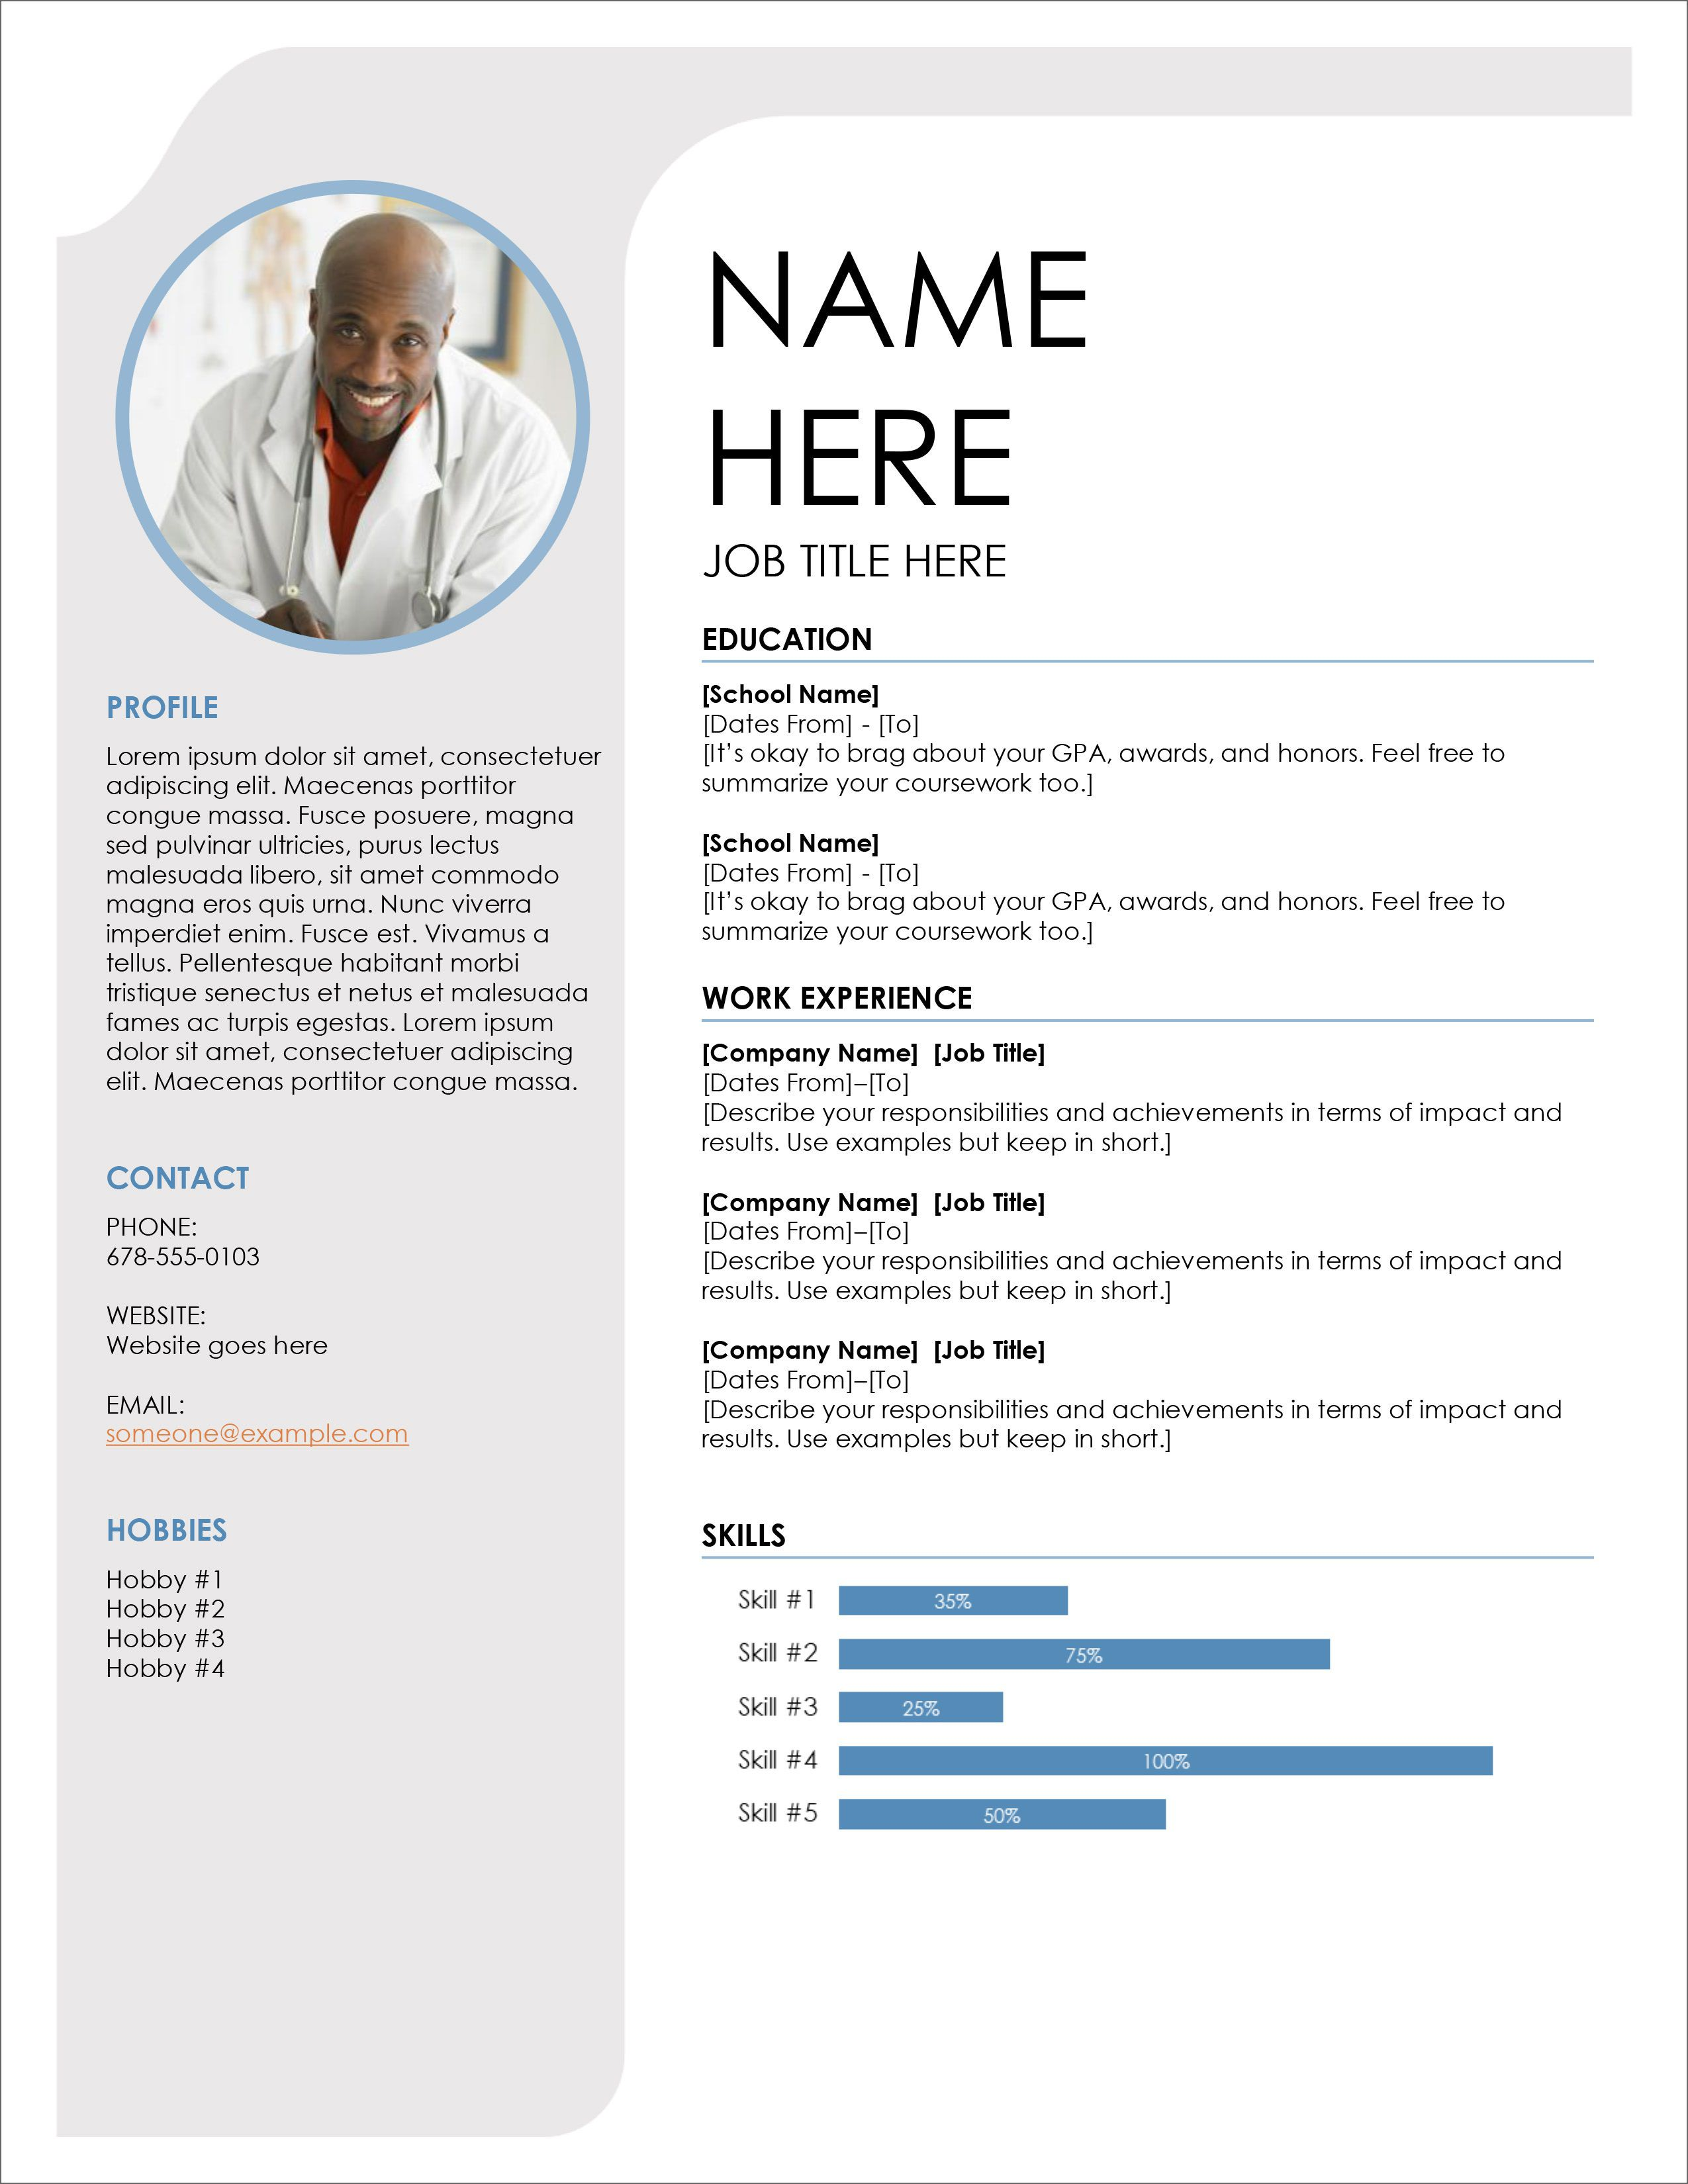 008 Surprising Free Basic Resume Template Download Image  M Word Quora For Microsoft 2010Full